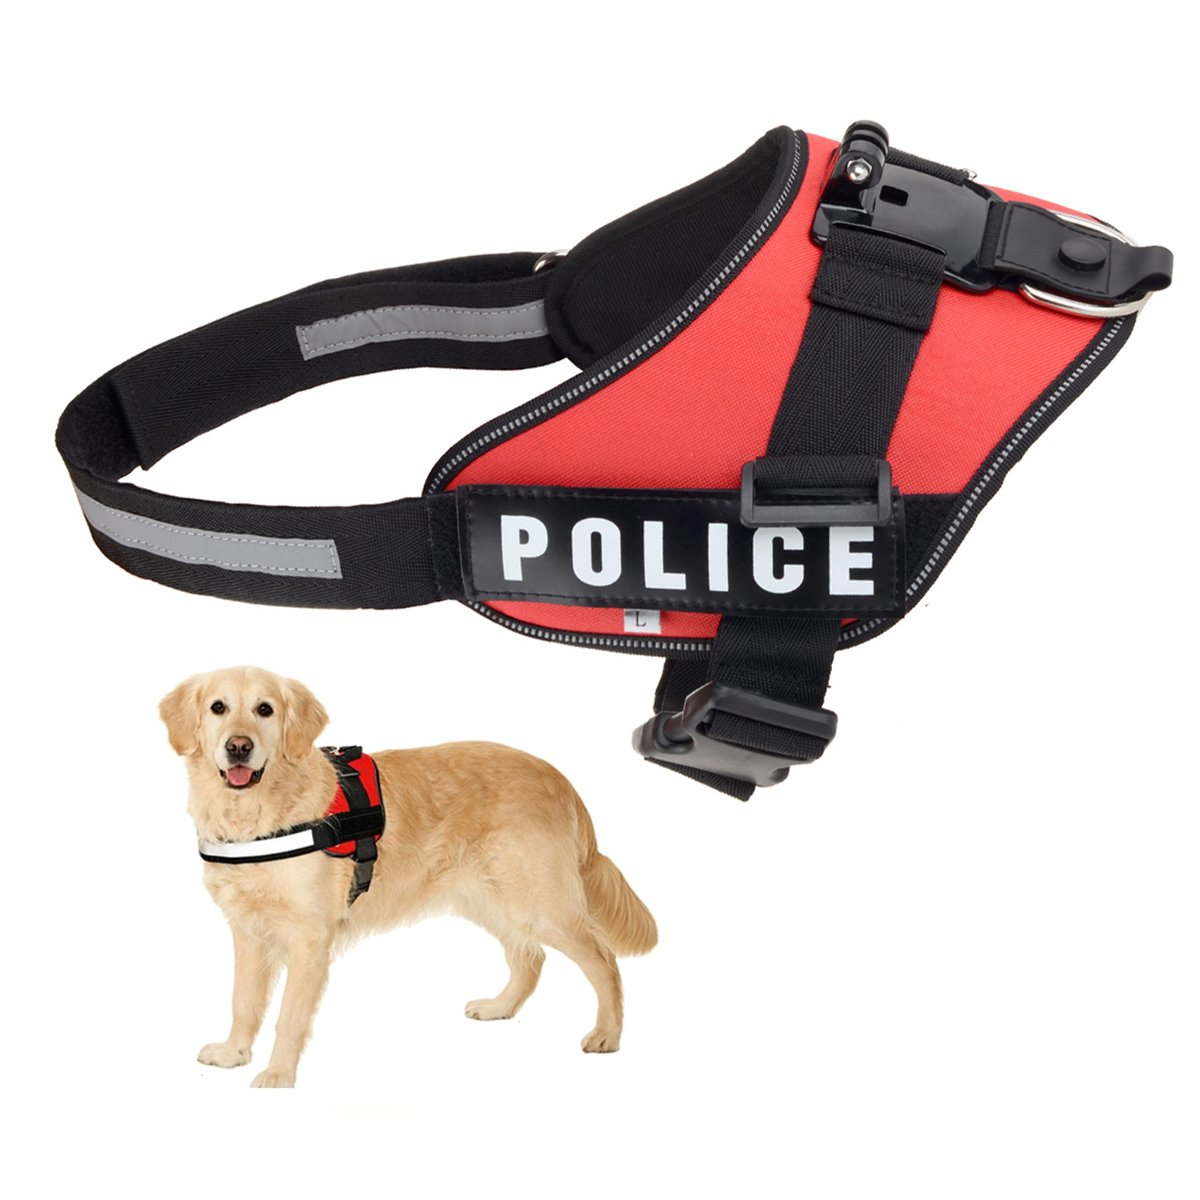 FOTOWELT para perro ajustable Fetch Arnés Cinturón de pecho Cinturón Monte Para Cámara GoPro Hero 1 2 3 + 4 Dazzne P2, SJ4000, SJ5000, SJCAM Xiaomi Yi: ...